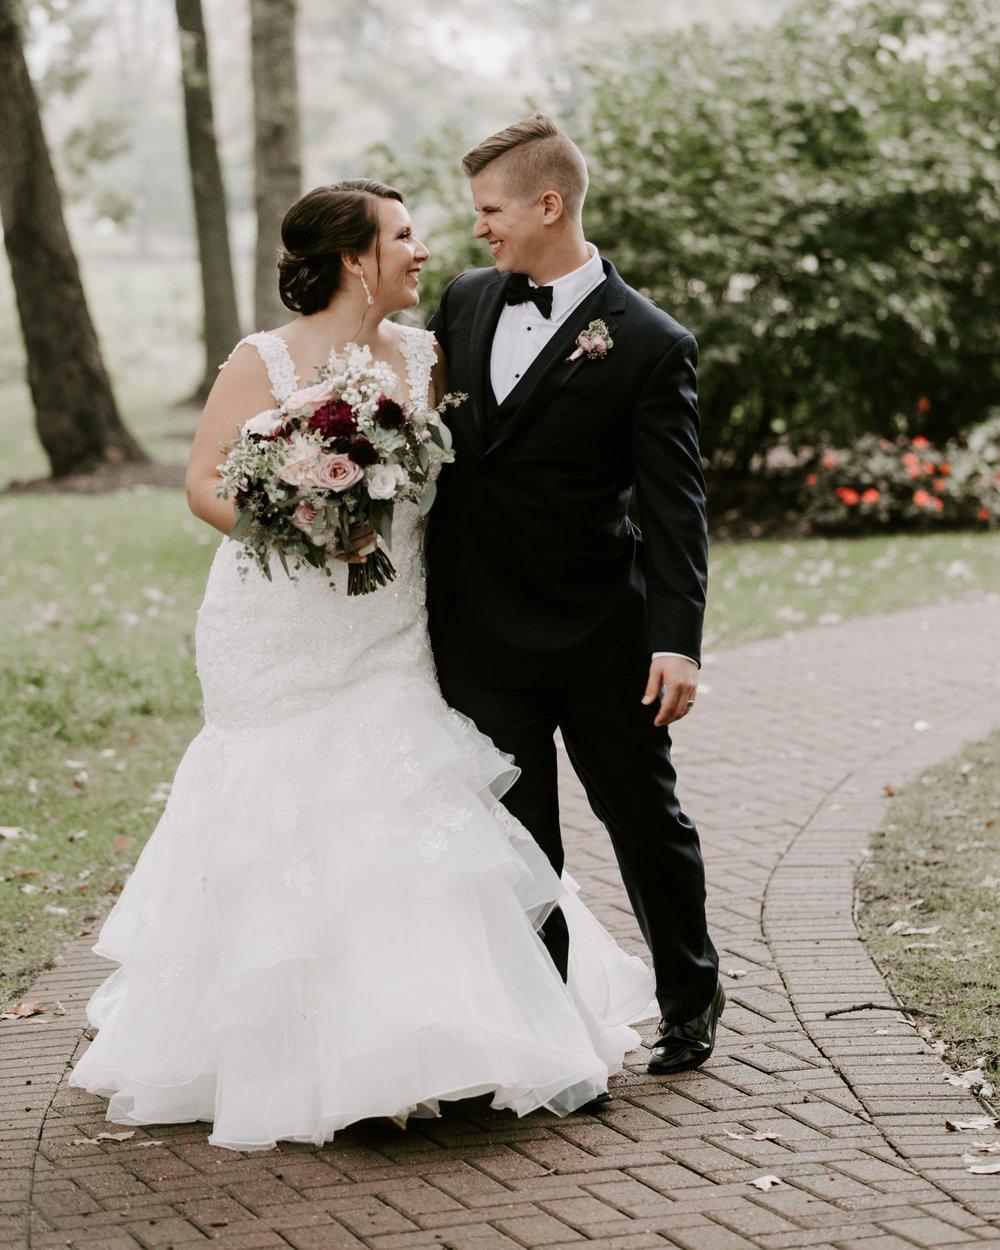 dugan Imaging Destination Wedding Photography  (2 of 7).jpg